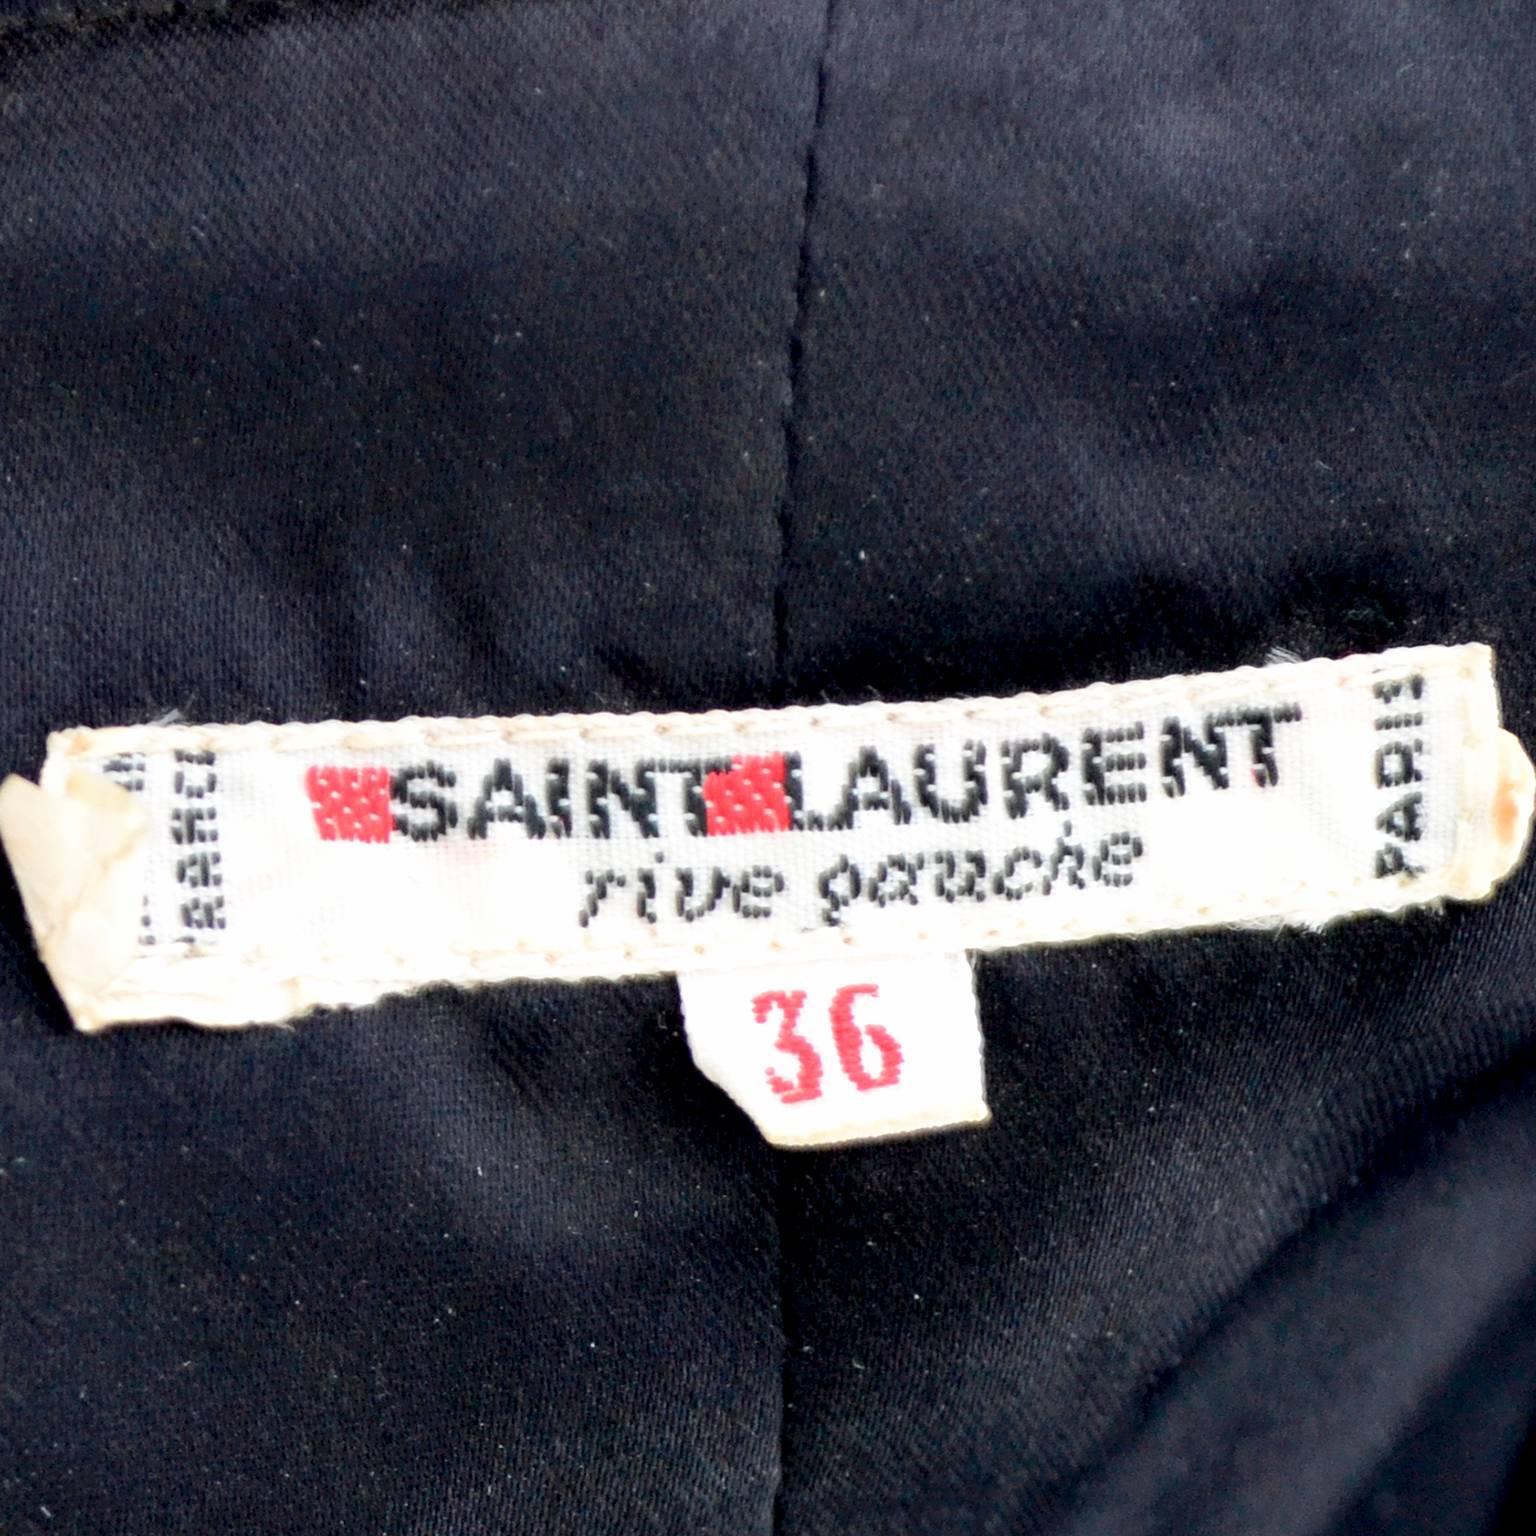 d875d65c40 Yves Saint Laurent Vintage YSL Dress 2 pc Black Evening Gown 1970s Size 36  US 2 For Sale at 1stdibs